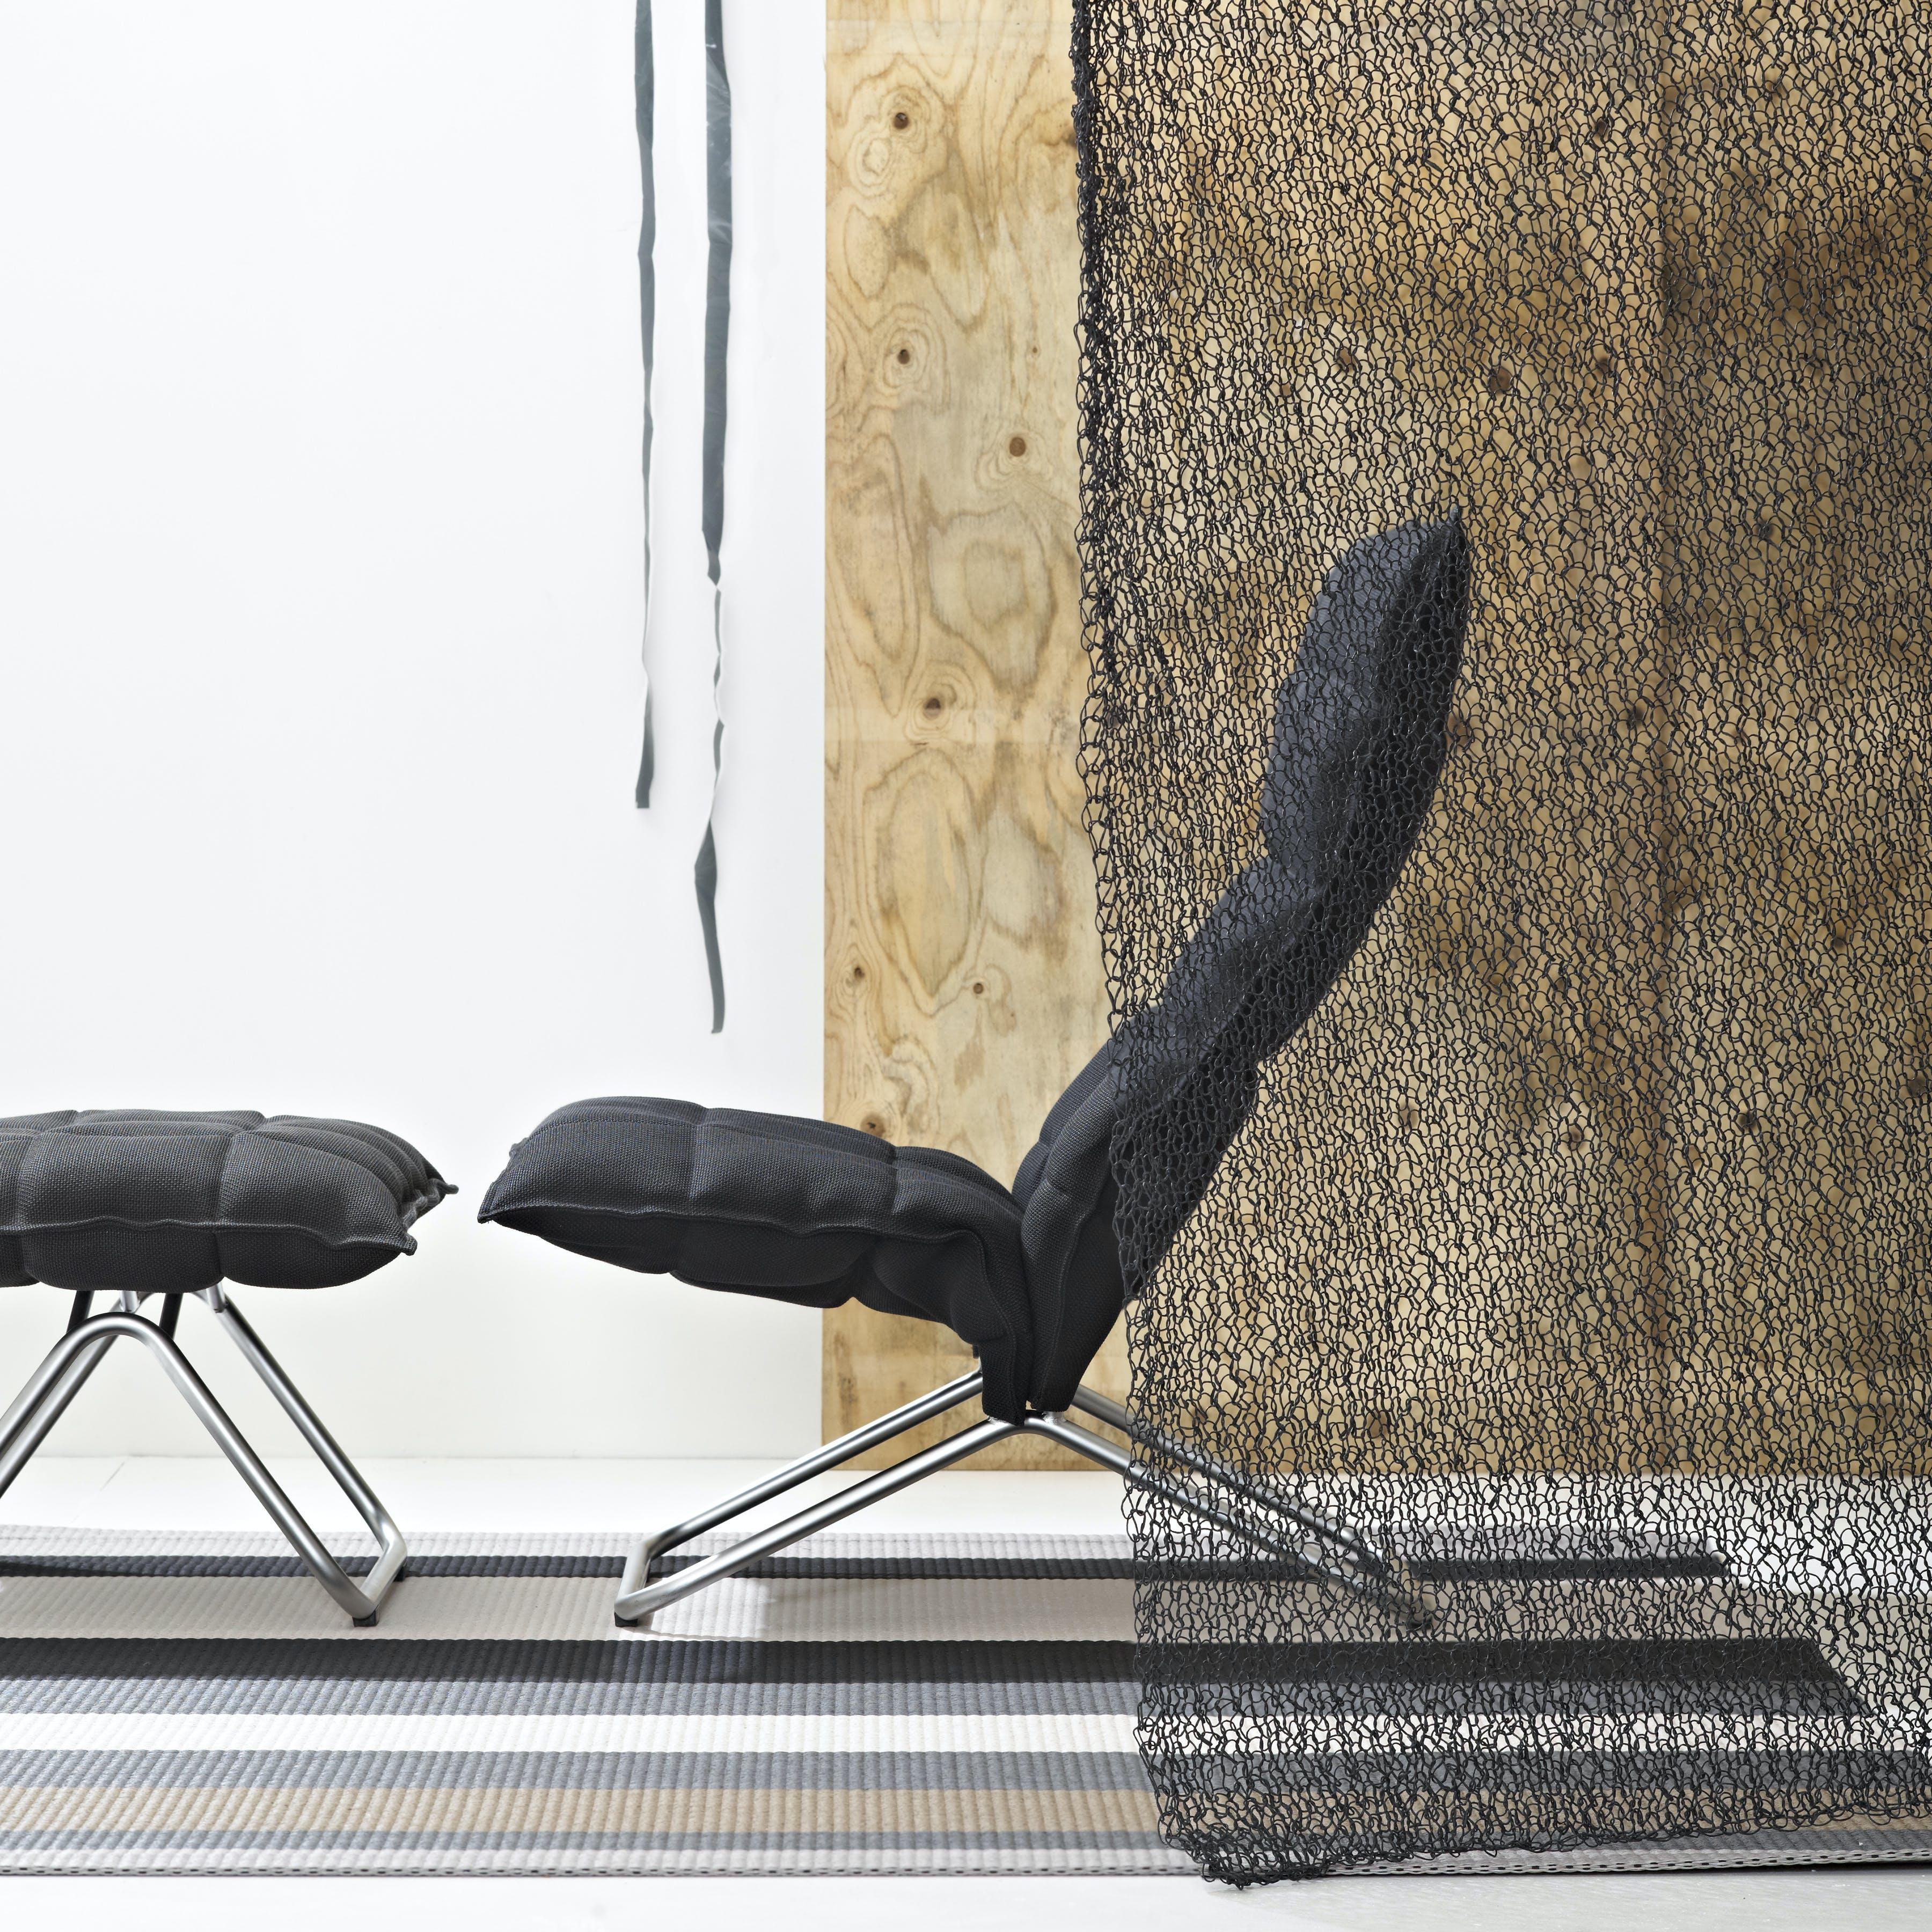 46003 Narrow K Chair And 46013 Narrow K Ottoman With Black Tubular Feet Interior